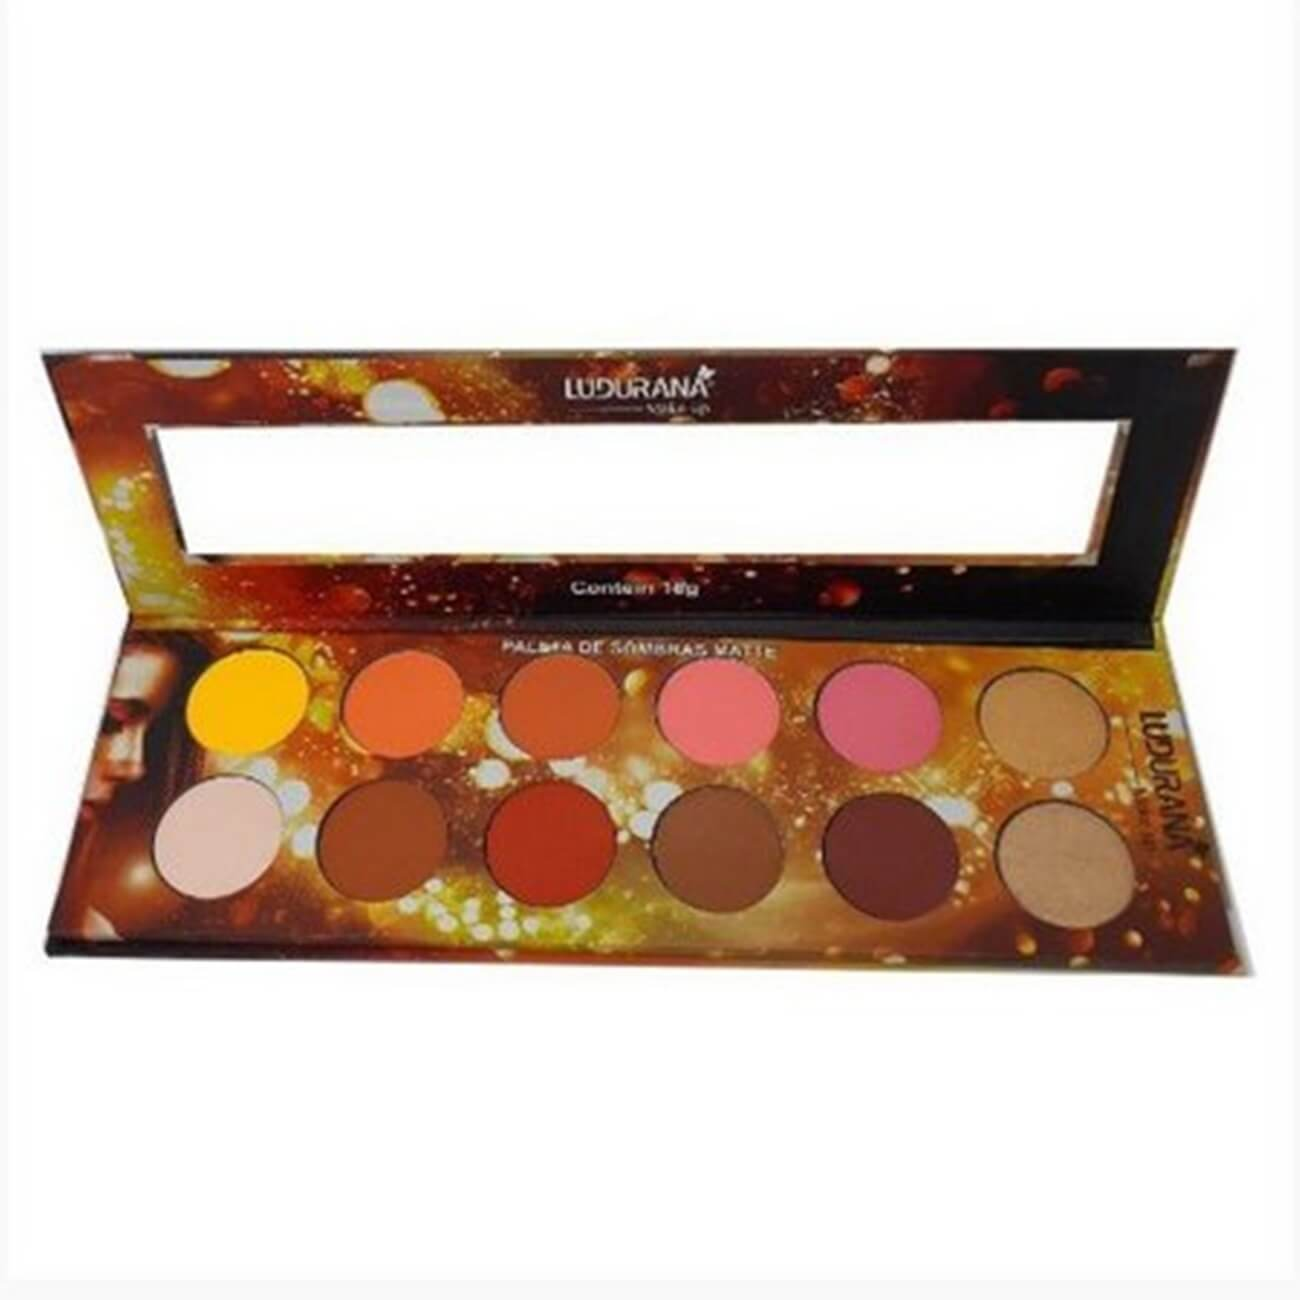 Paleta de Sombras Matte - Ludurana Make Up